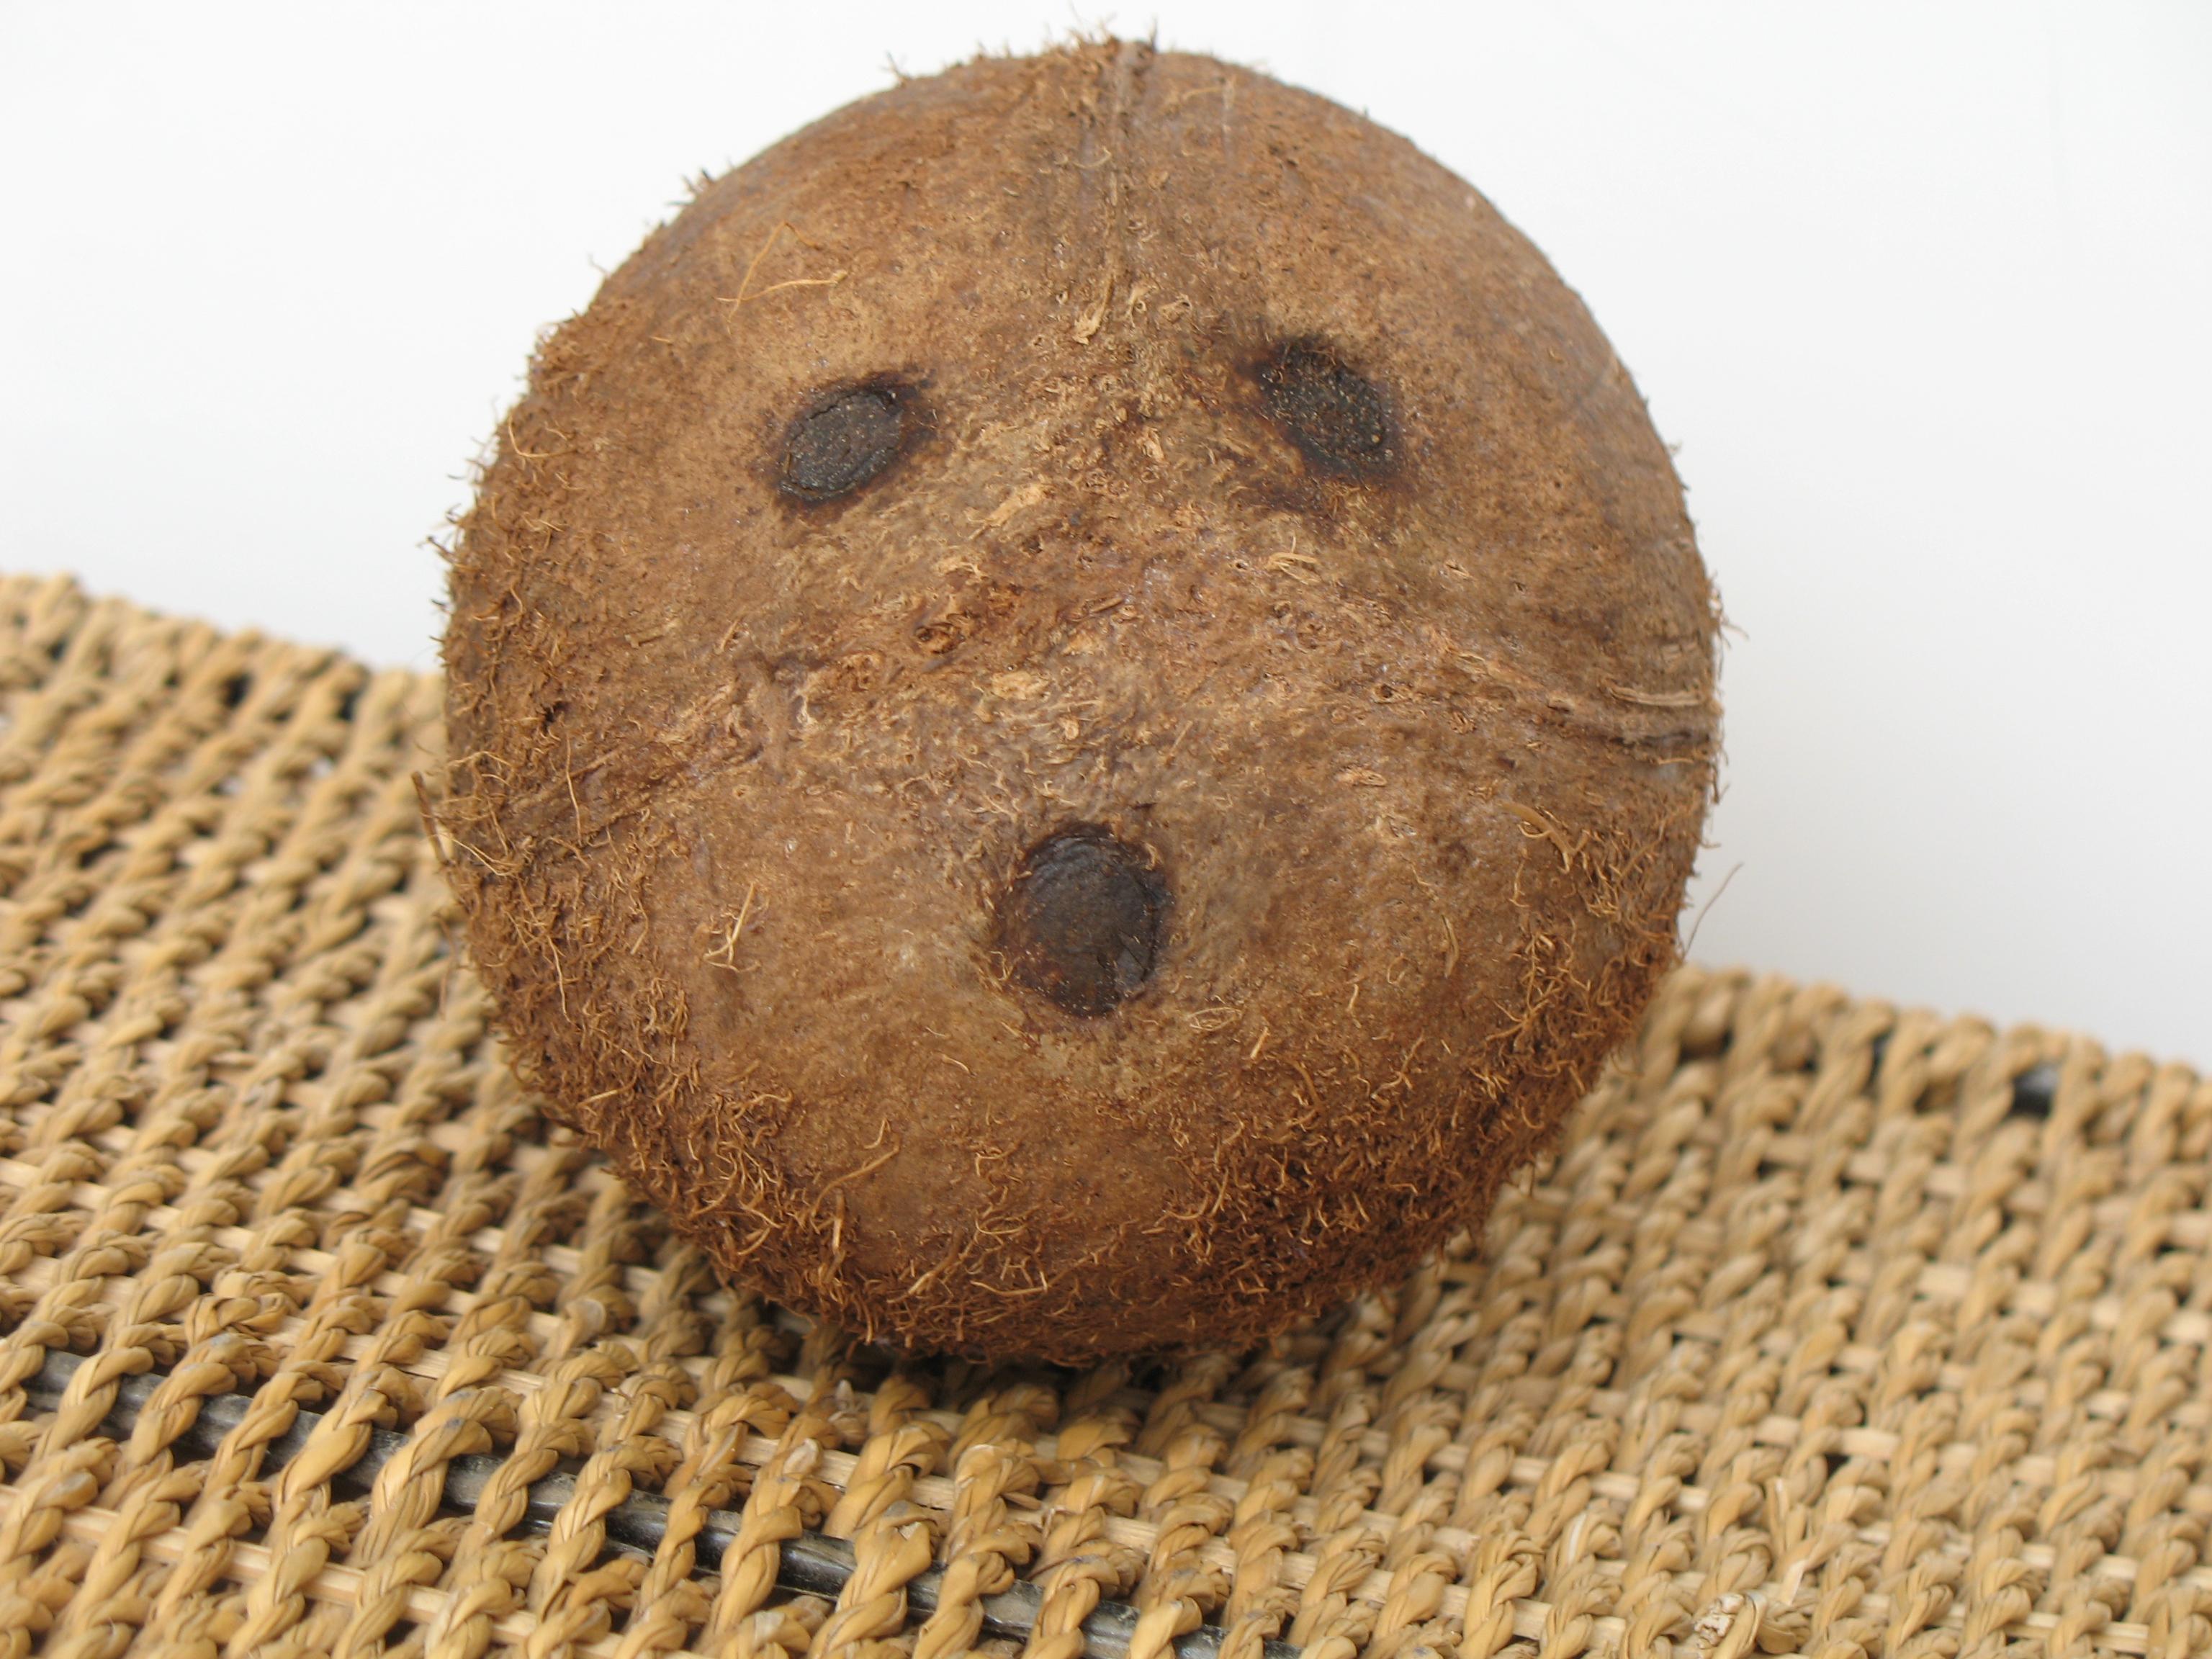 Coconut resembling a human face, head